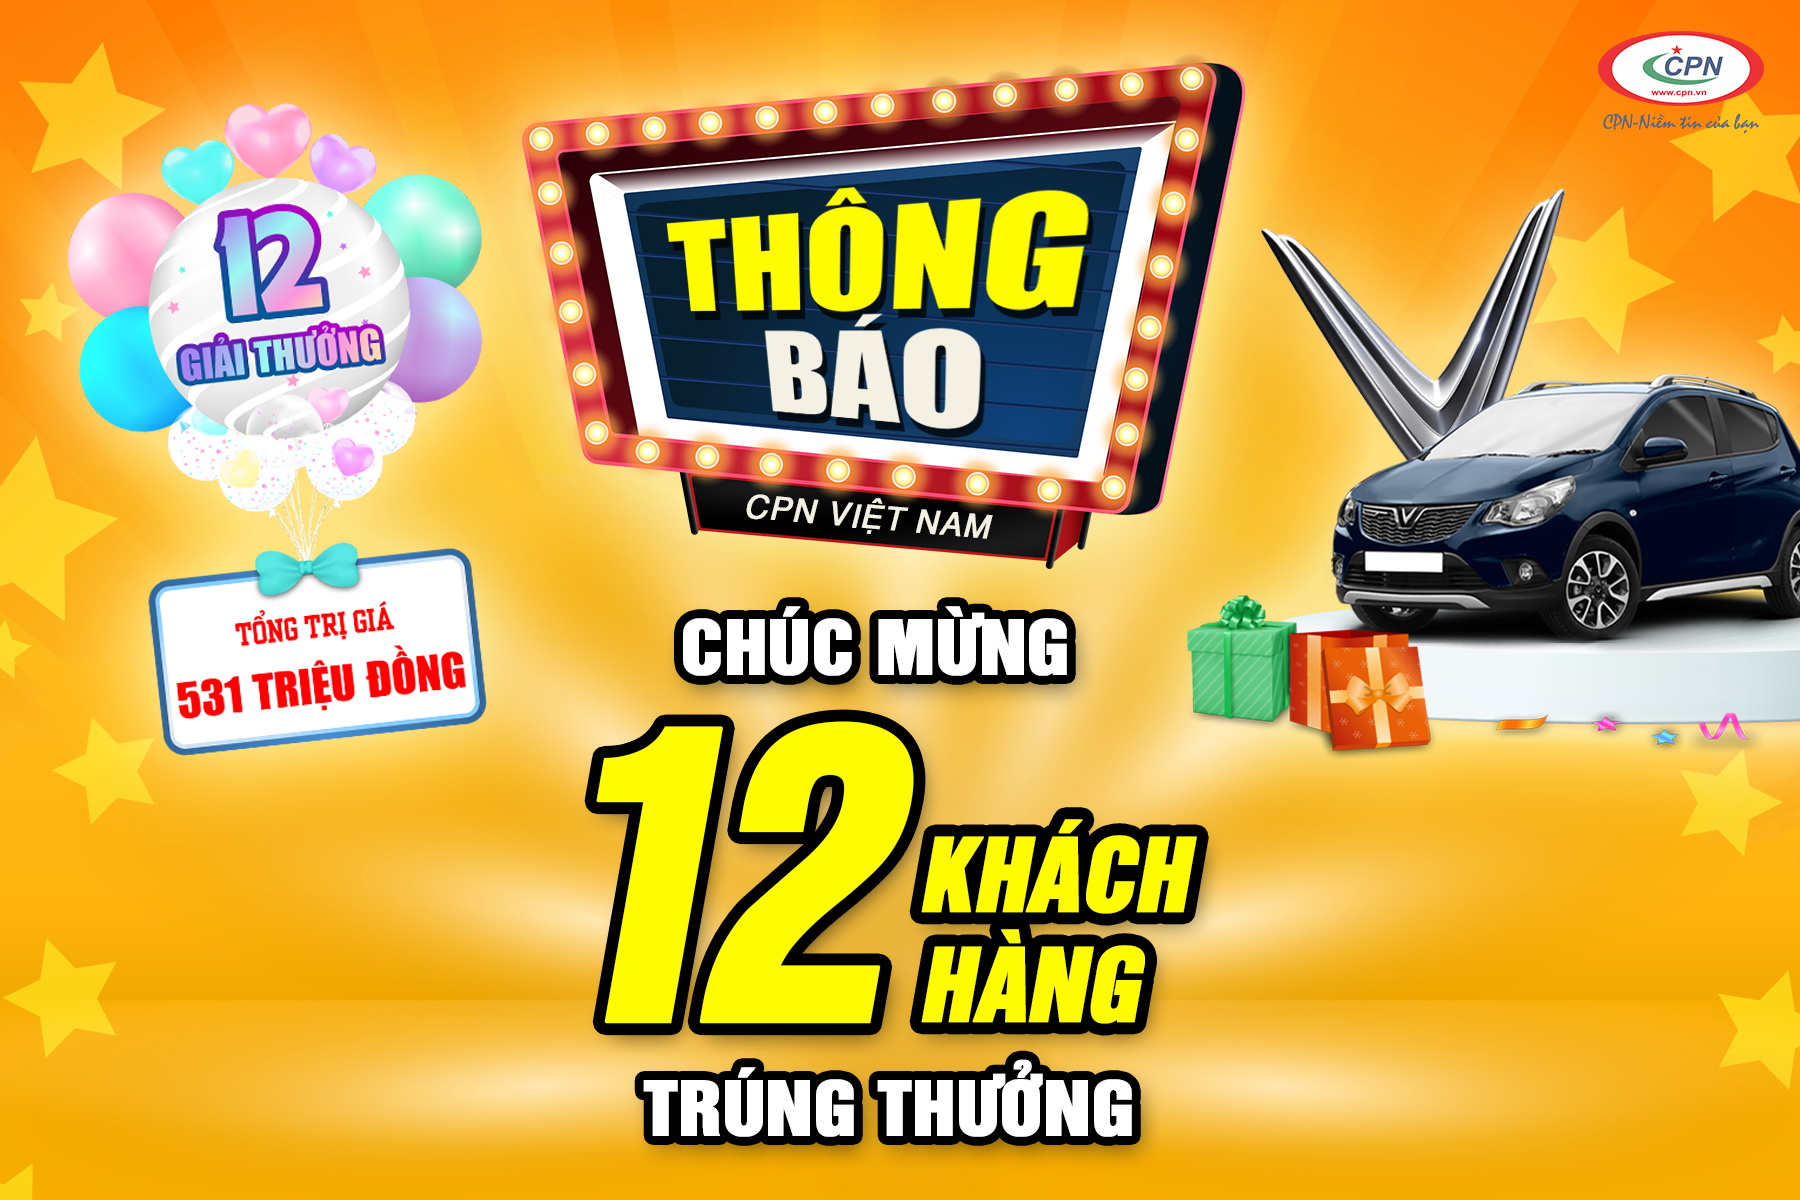 900x600-thong-bao-chuc-mung.jpg